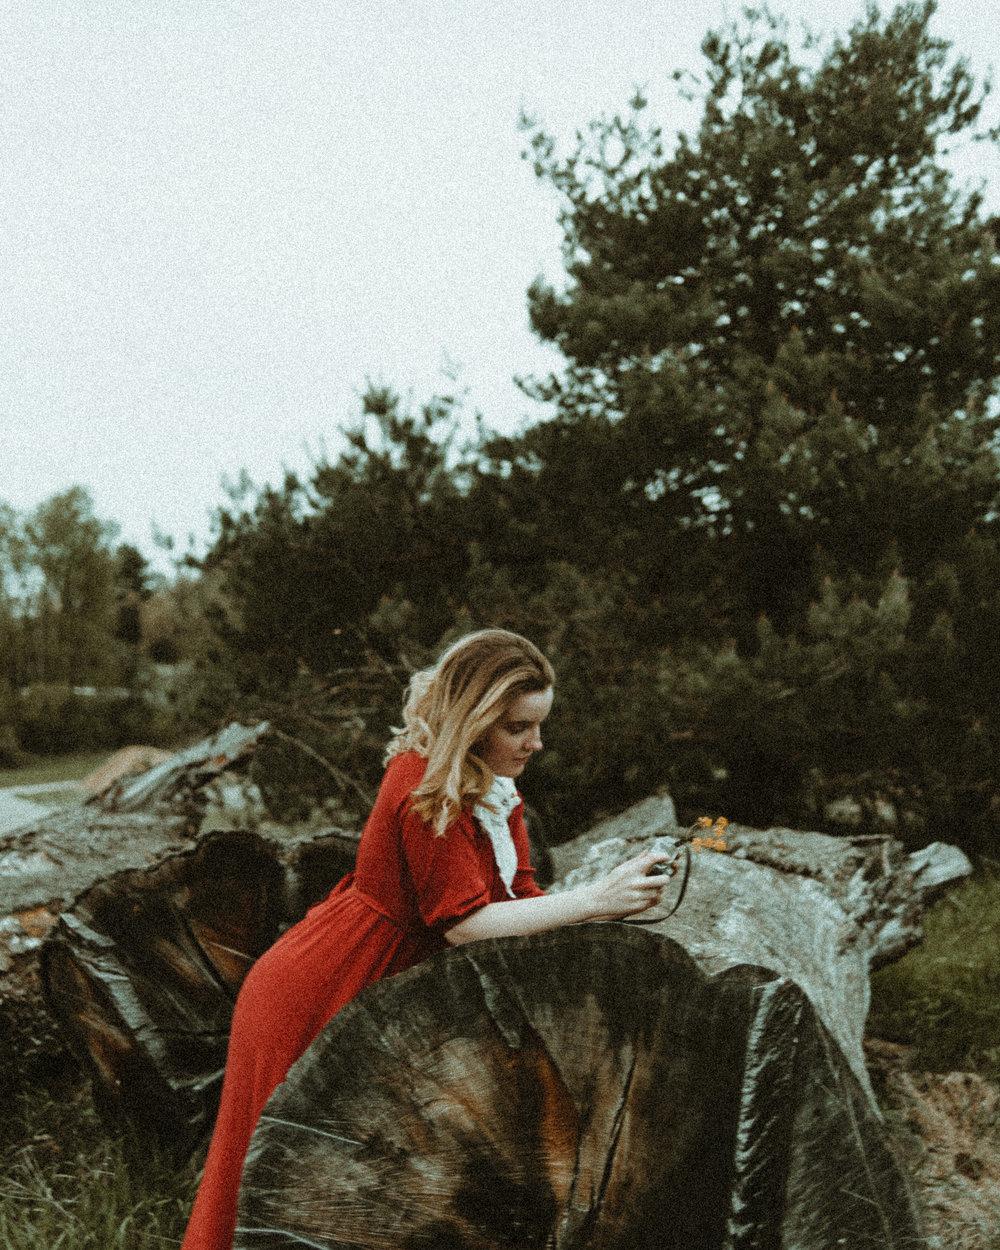 Nicole Mullaly-20180518-20-46-15.JPG